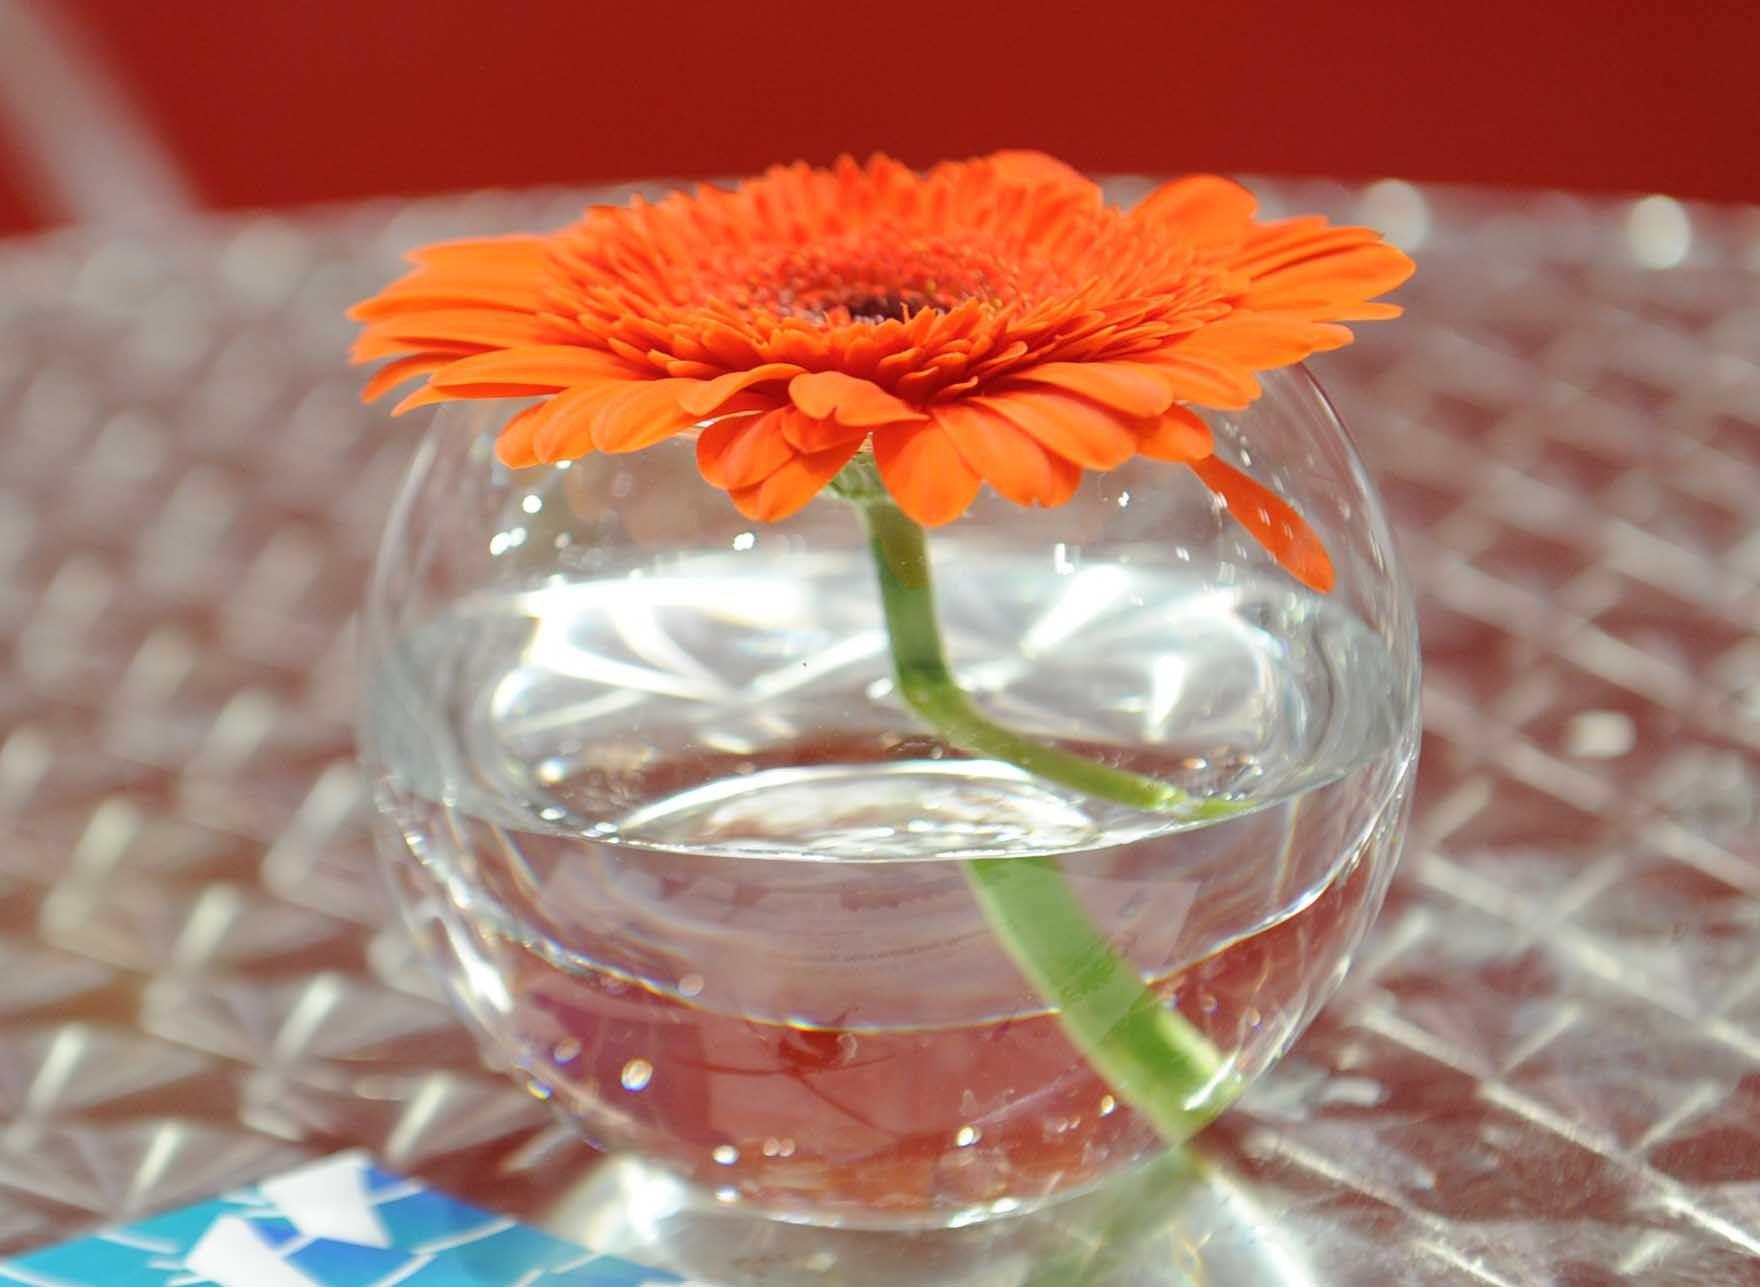 vintage rose colored glass vase of orange glass vase pics 47 od single orange gerbera in gfb intended for orange glass vase pics 47 od single orange gerbera in gfb celebraciones of orange glass vase